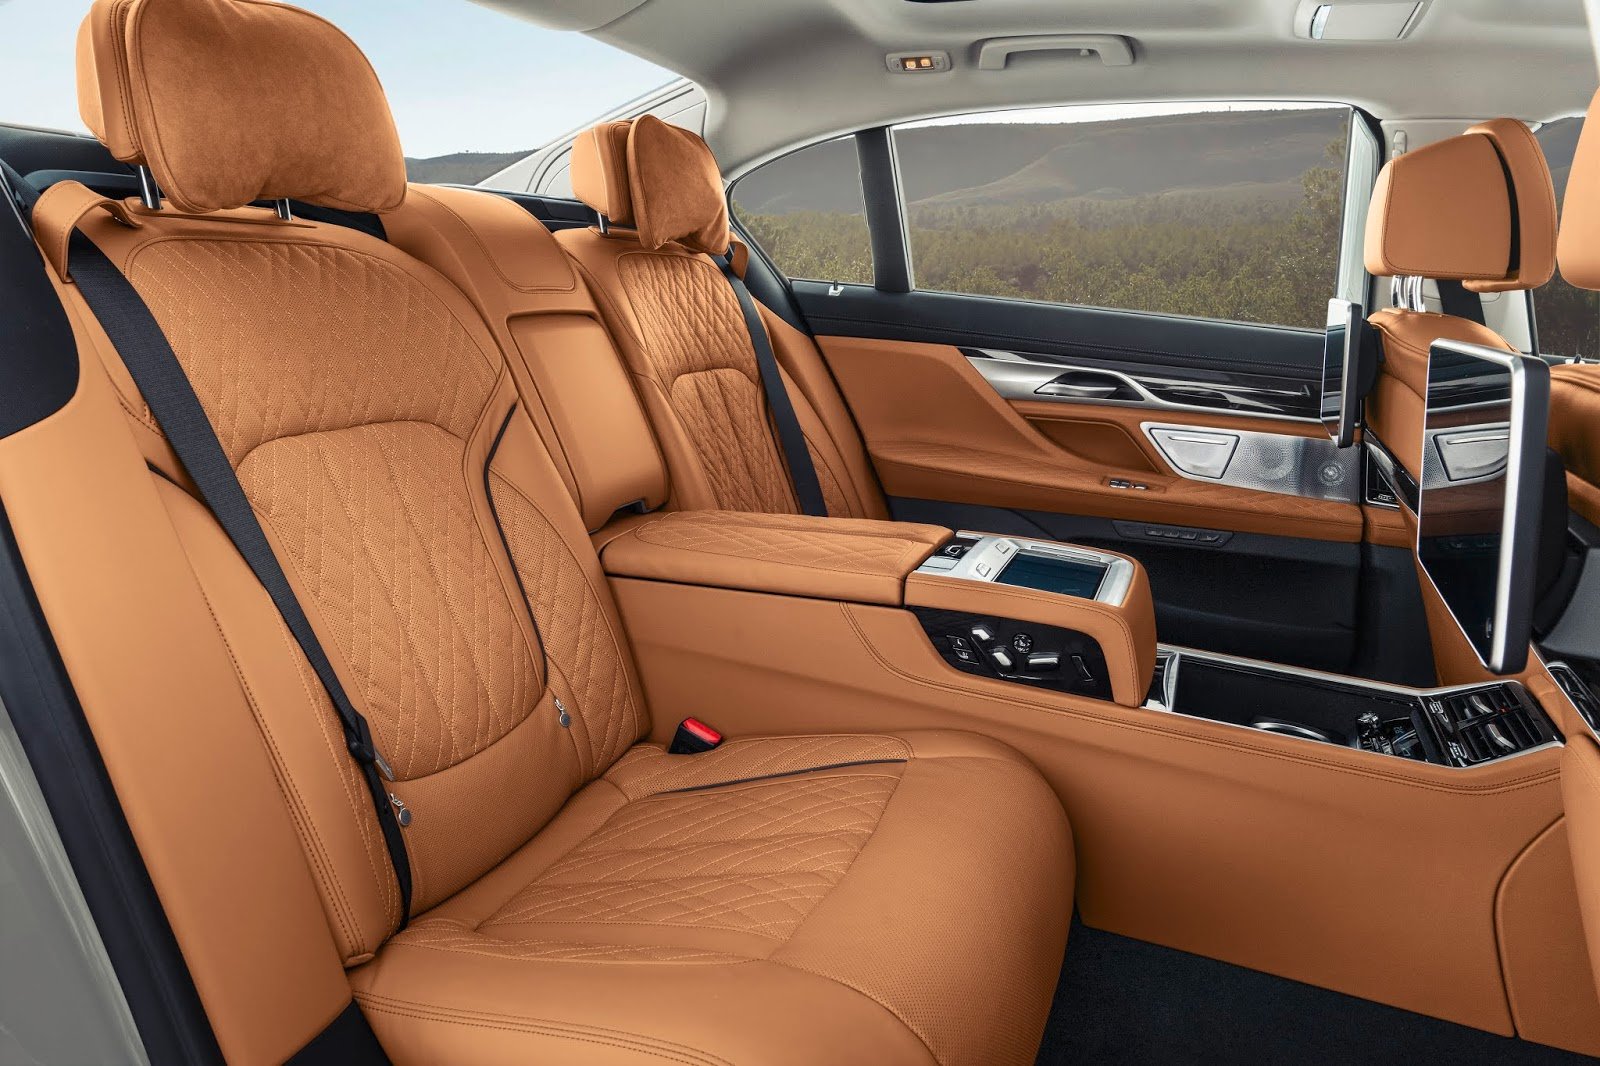 P90333075 highRes the new bmw 7 series Τα αστέρια της BMW για τη 89η Διεθνή Έκθεση Αυτοκινήτου της Γενεύης BMW, BMW 7-series, Electric cars, Hybrid, Έκθεση, Έκθεση Γενεύης